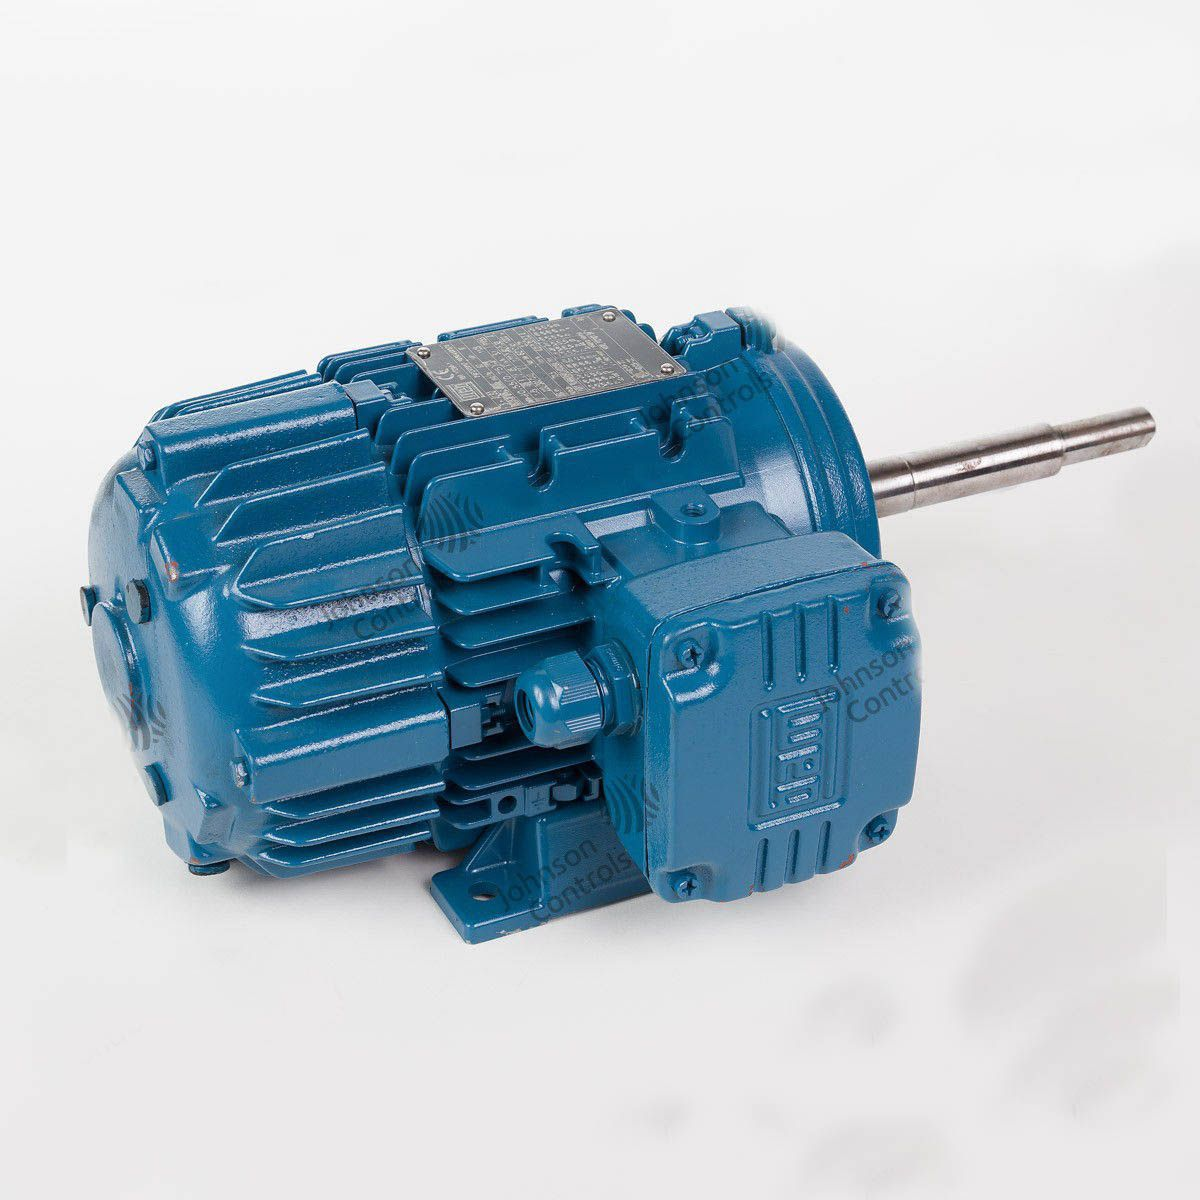 Motor Ventilador Elétrico Condensadora Chiller Hitachi HLD40028A